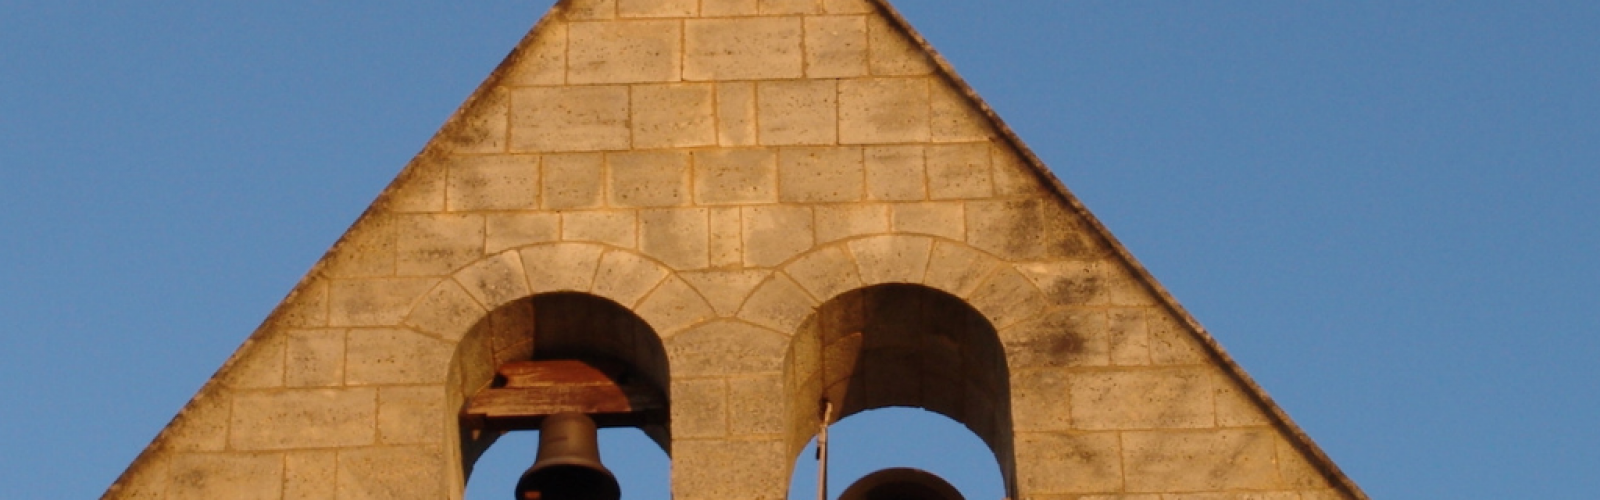 cloches monastère